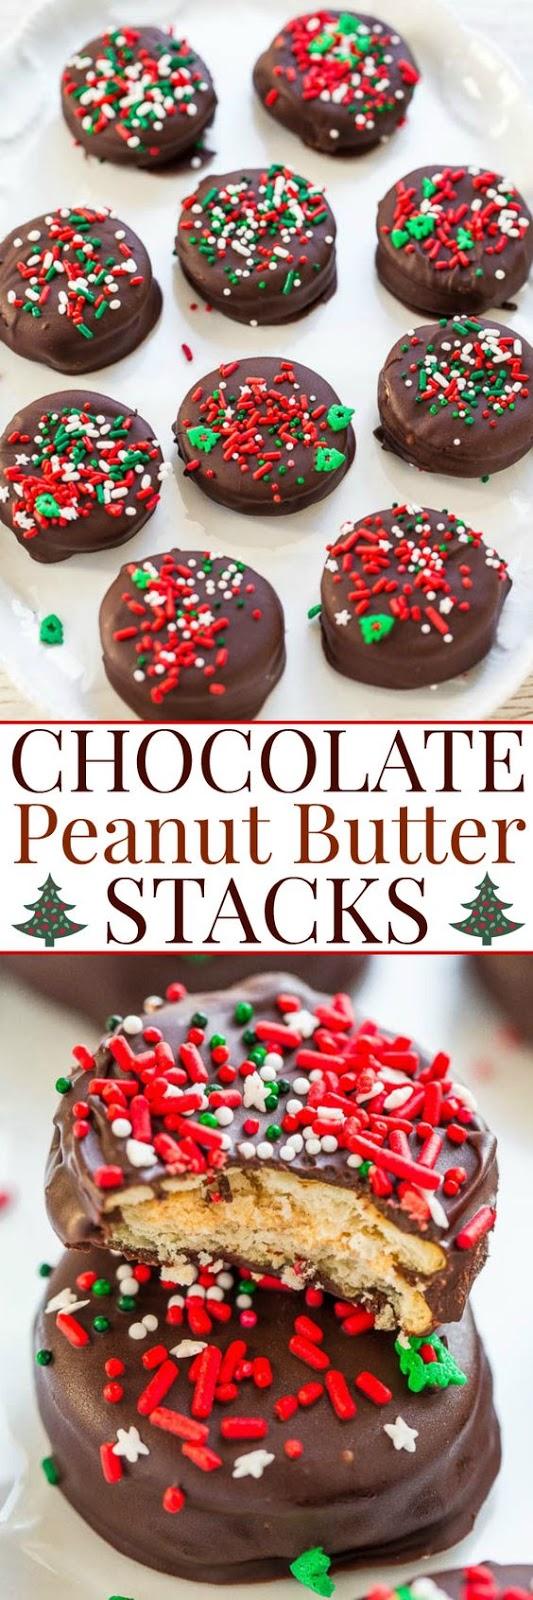 Chocolate Peanut Butter Stacks Recipe